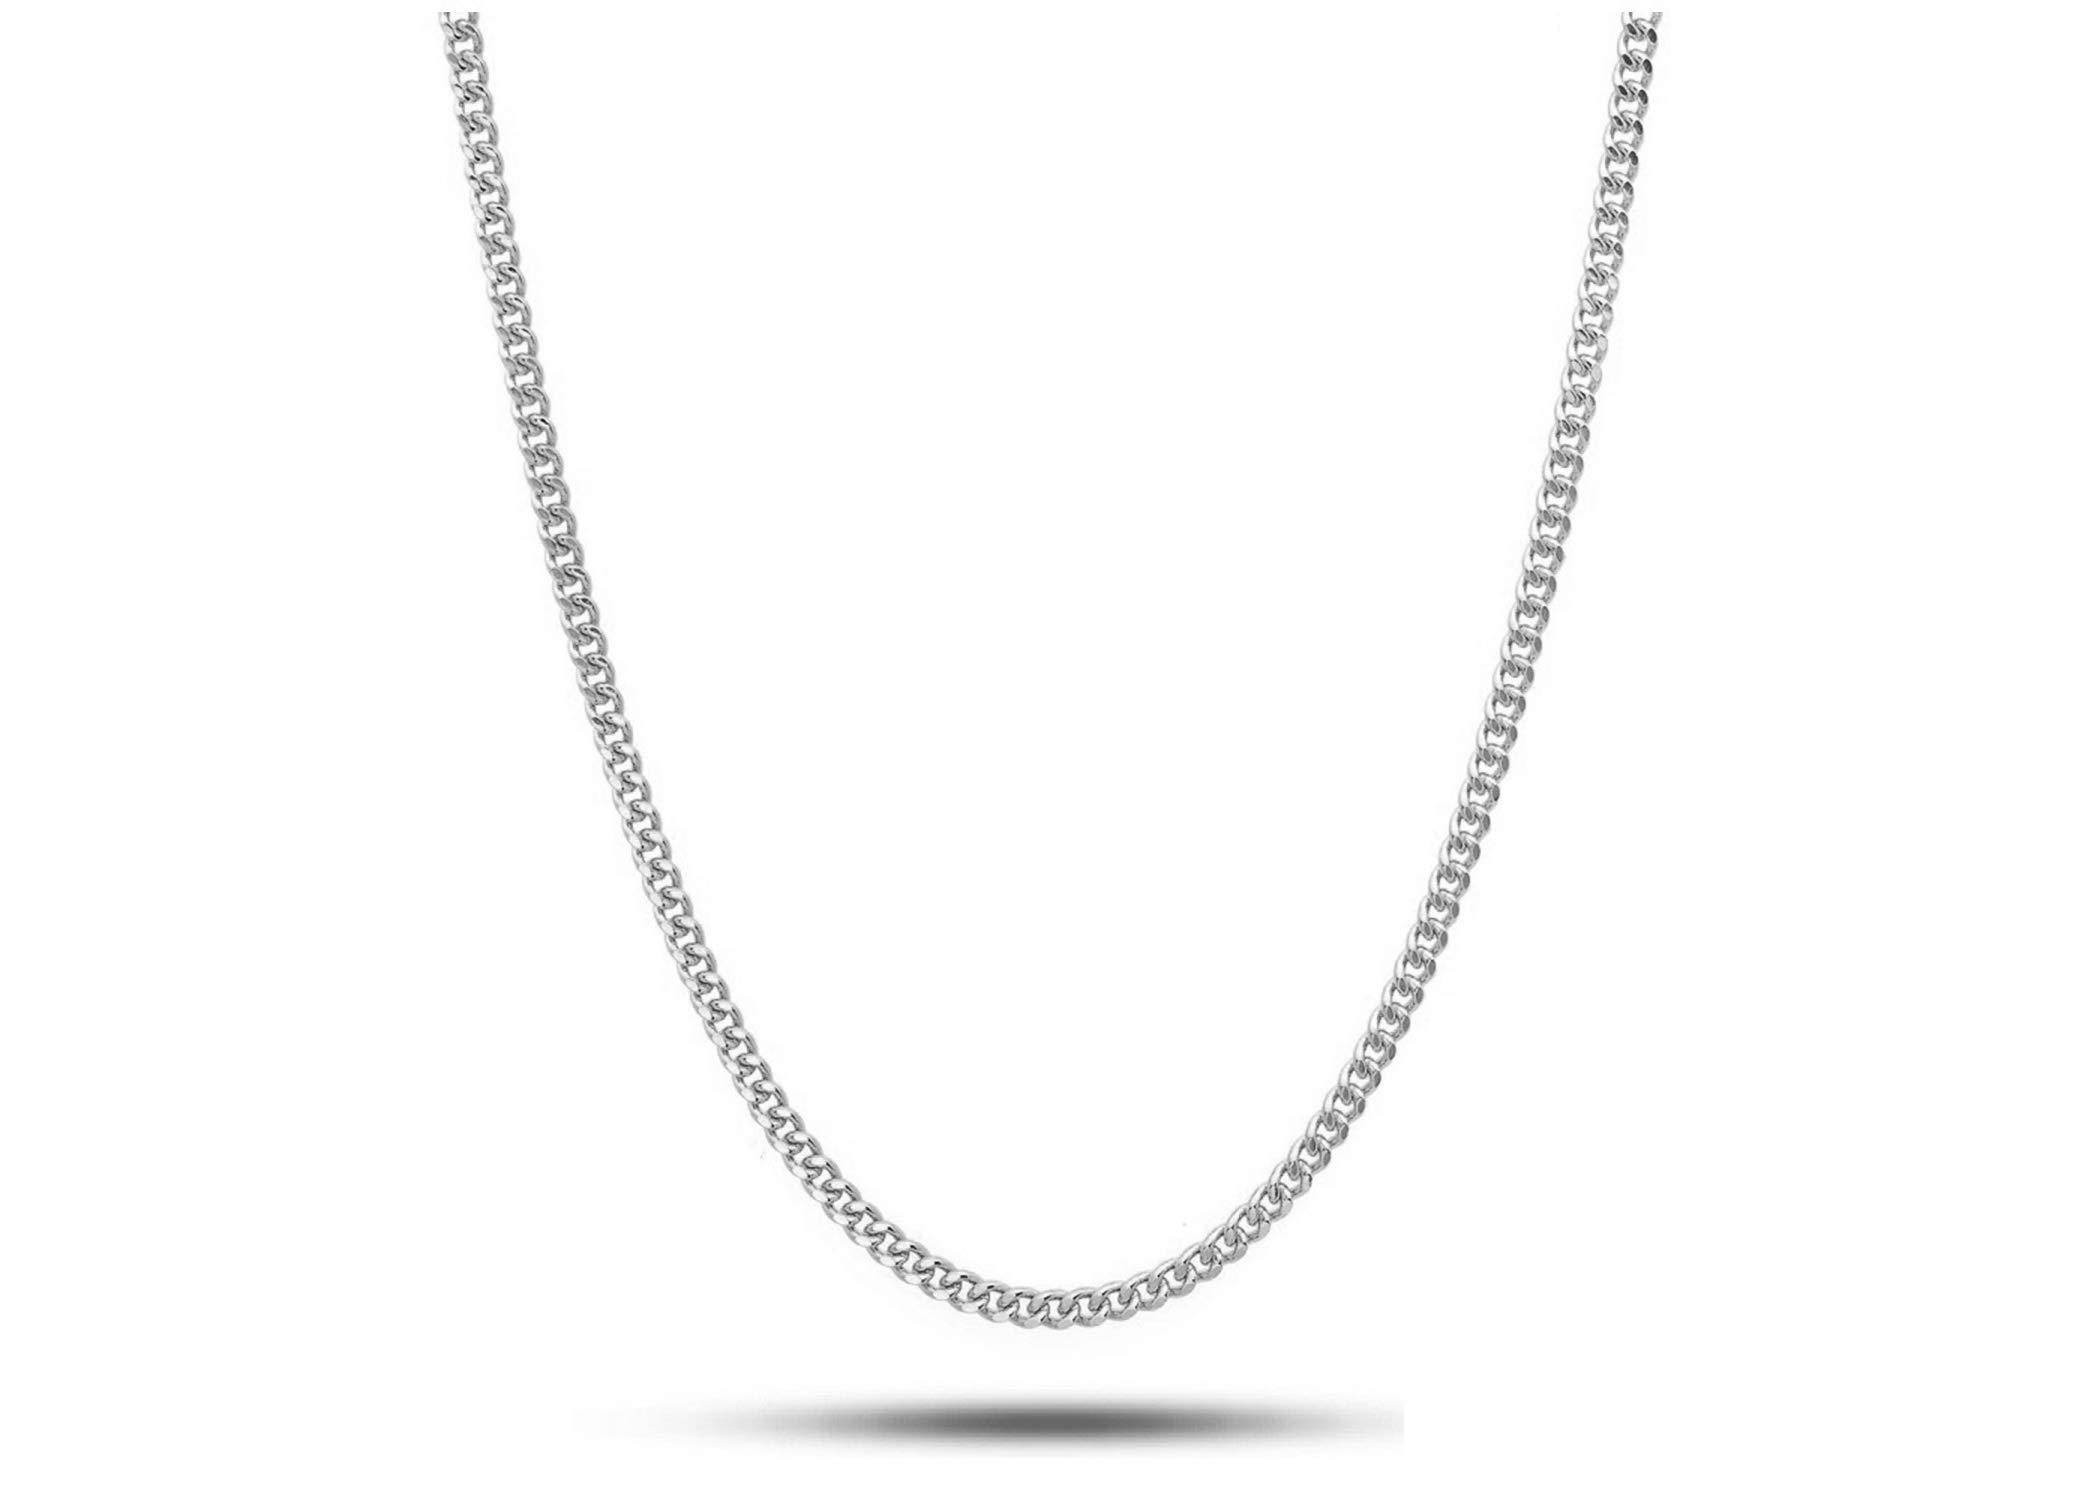 Pori Jewelers Genuine Platinum 950 Solid Diamond Cut Cuban/Curb Chain Necklace -1.0mm Thick (18)